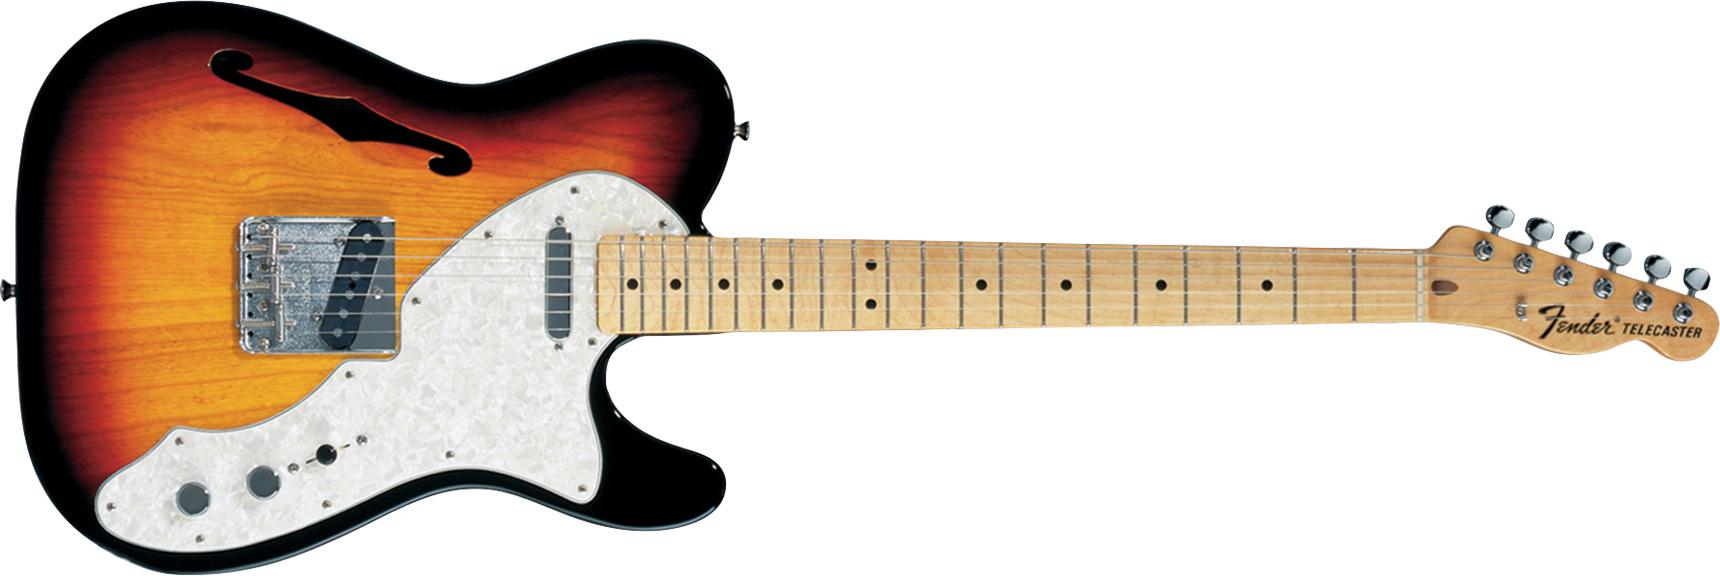 fender品牌_电吉他_classic